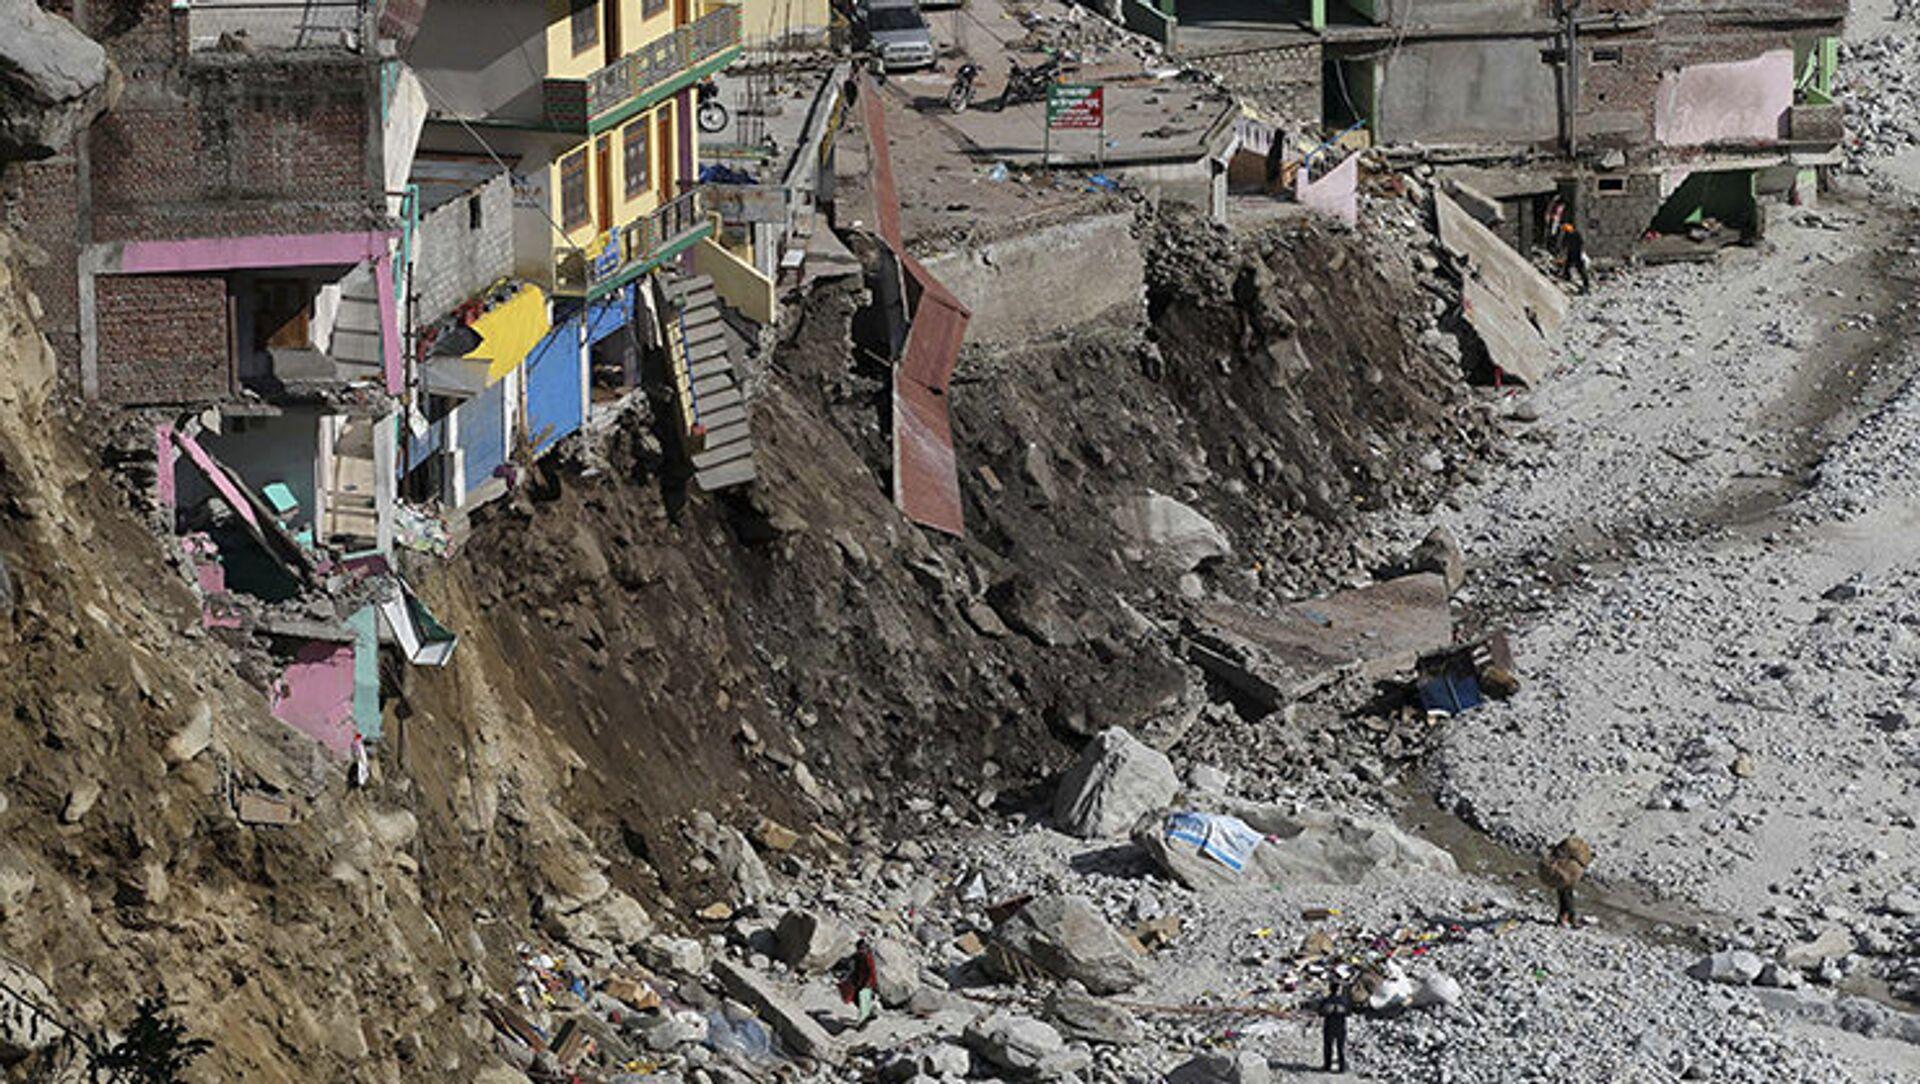 Glissement de terrain en Inde : 10 morts - Sputnik France, 1920, 11.08.2021